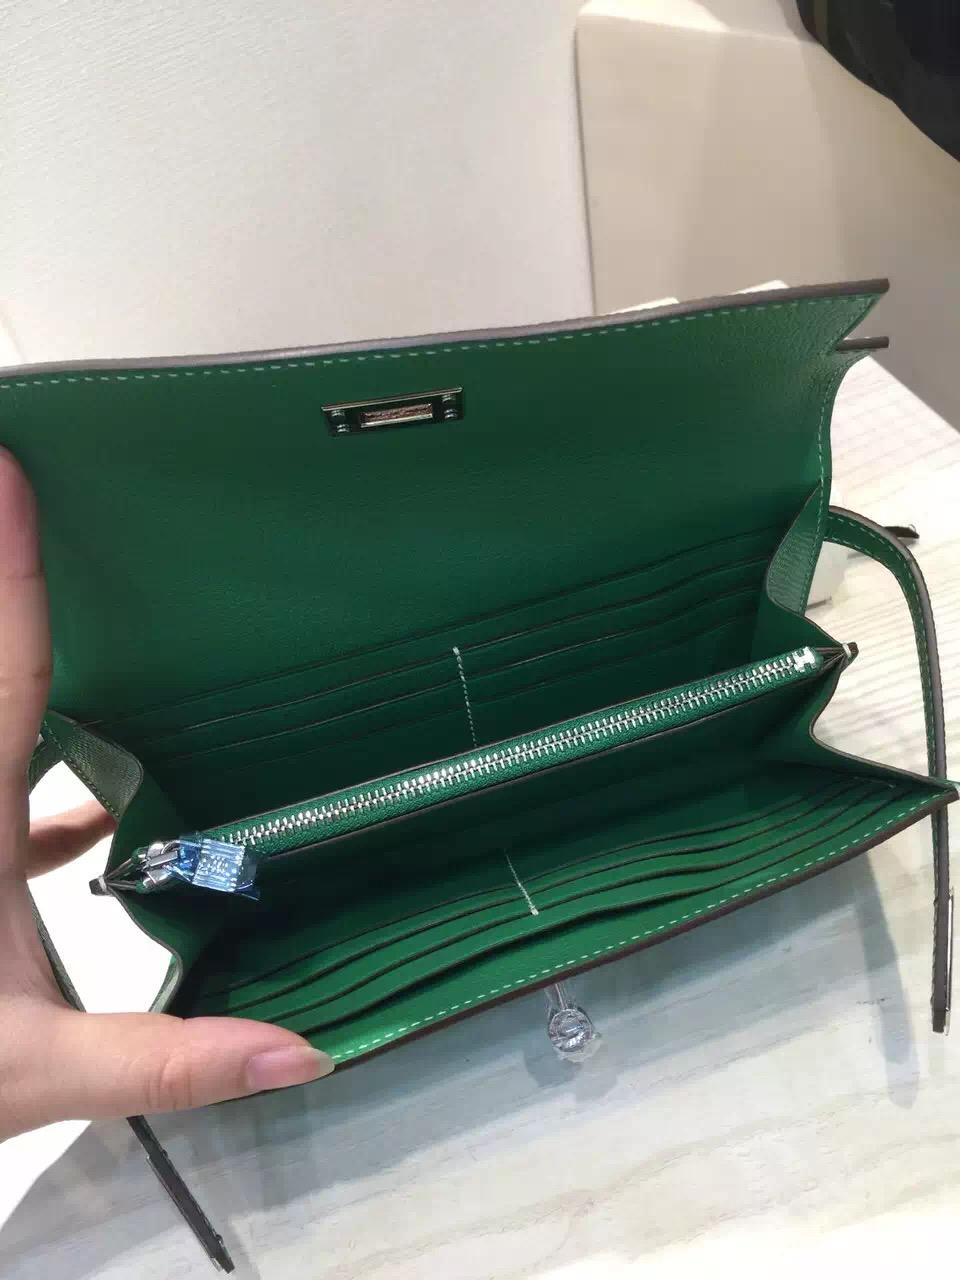 Discount Hermes Epsom Leather Bamboo Green Kelly Wallet Clutch Handbag